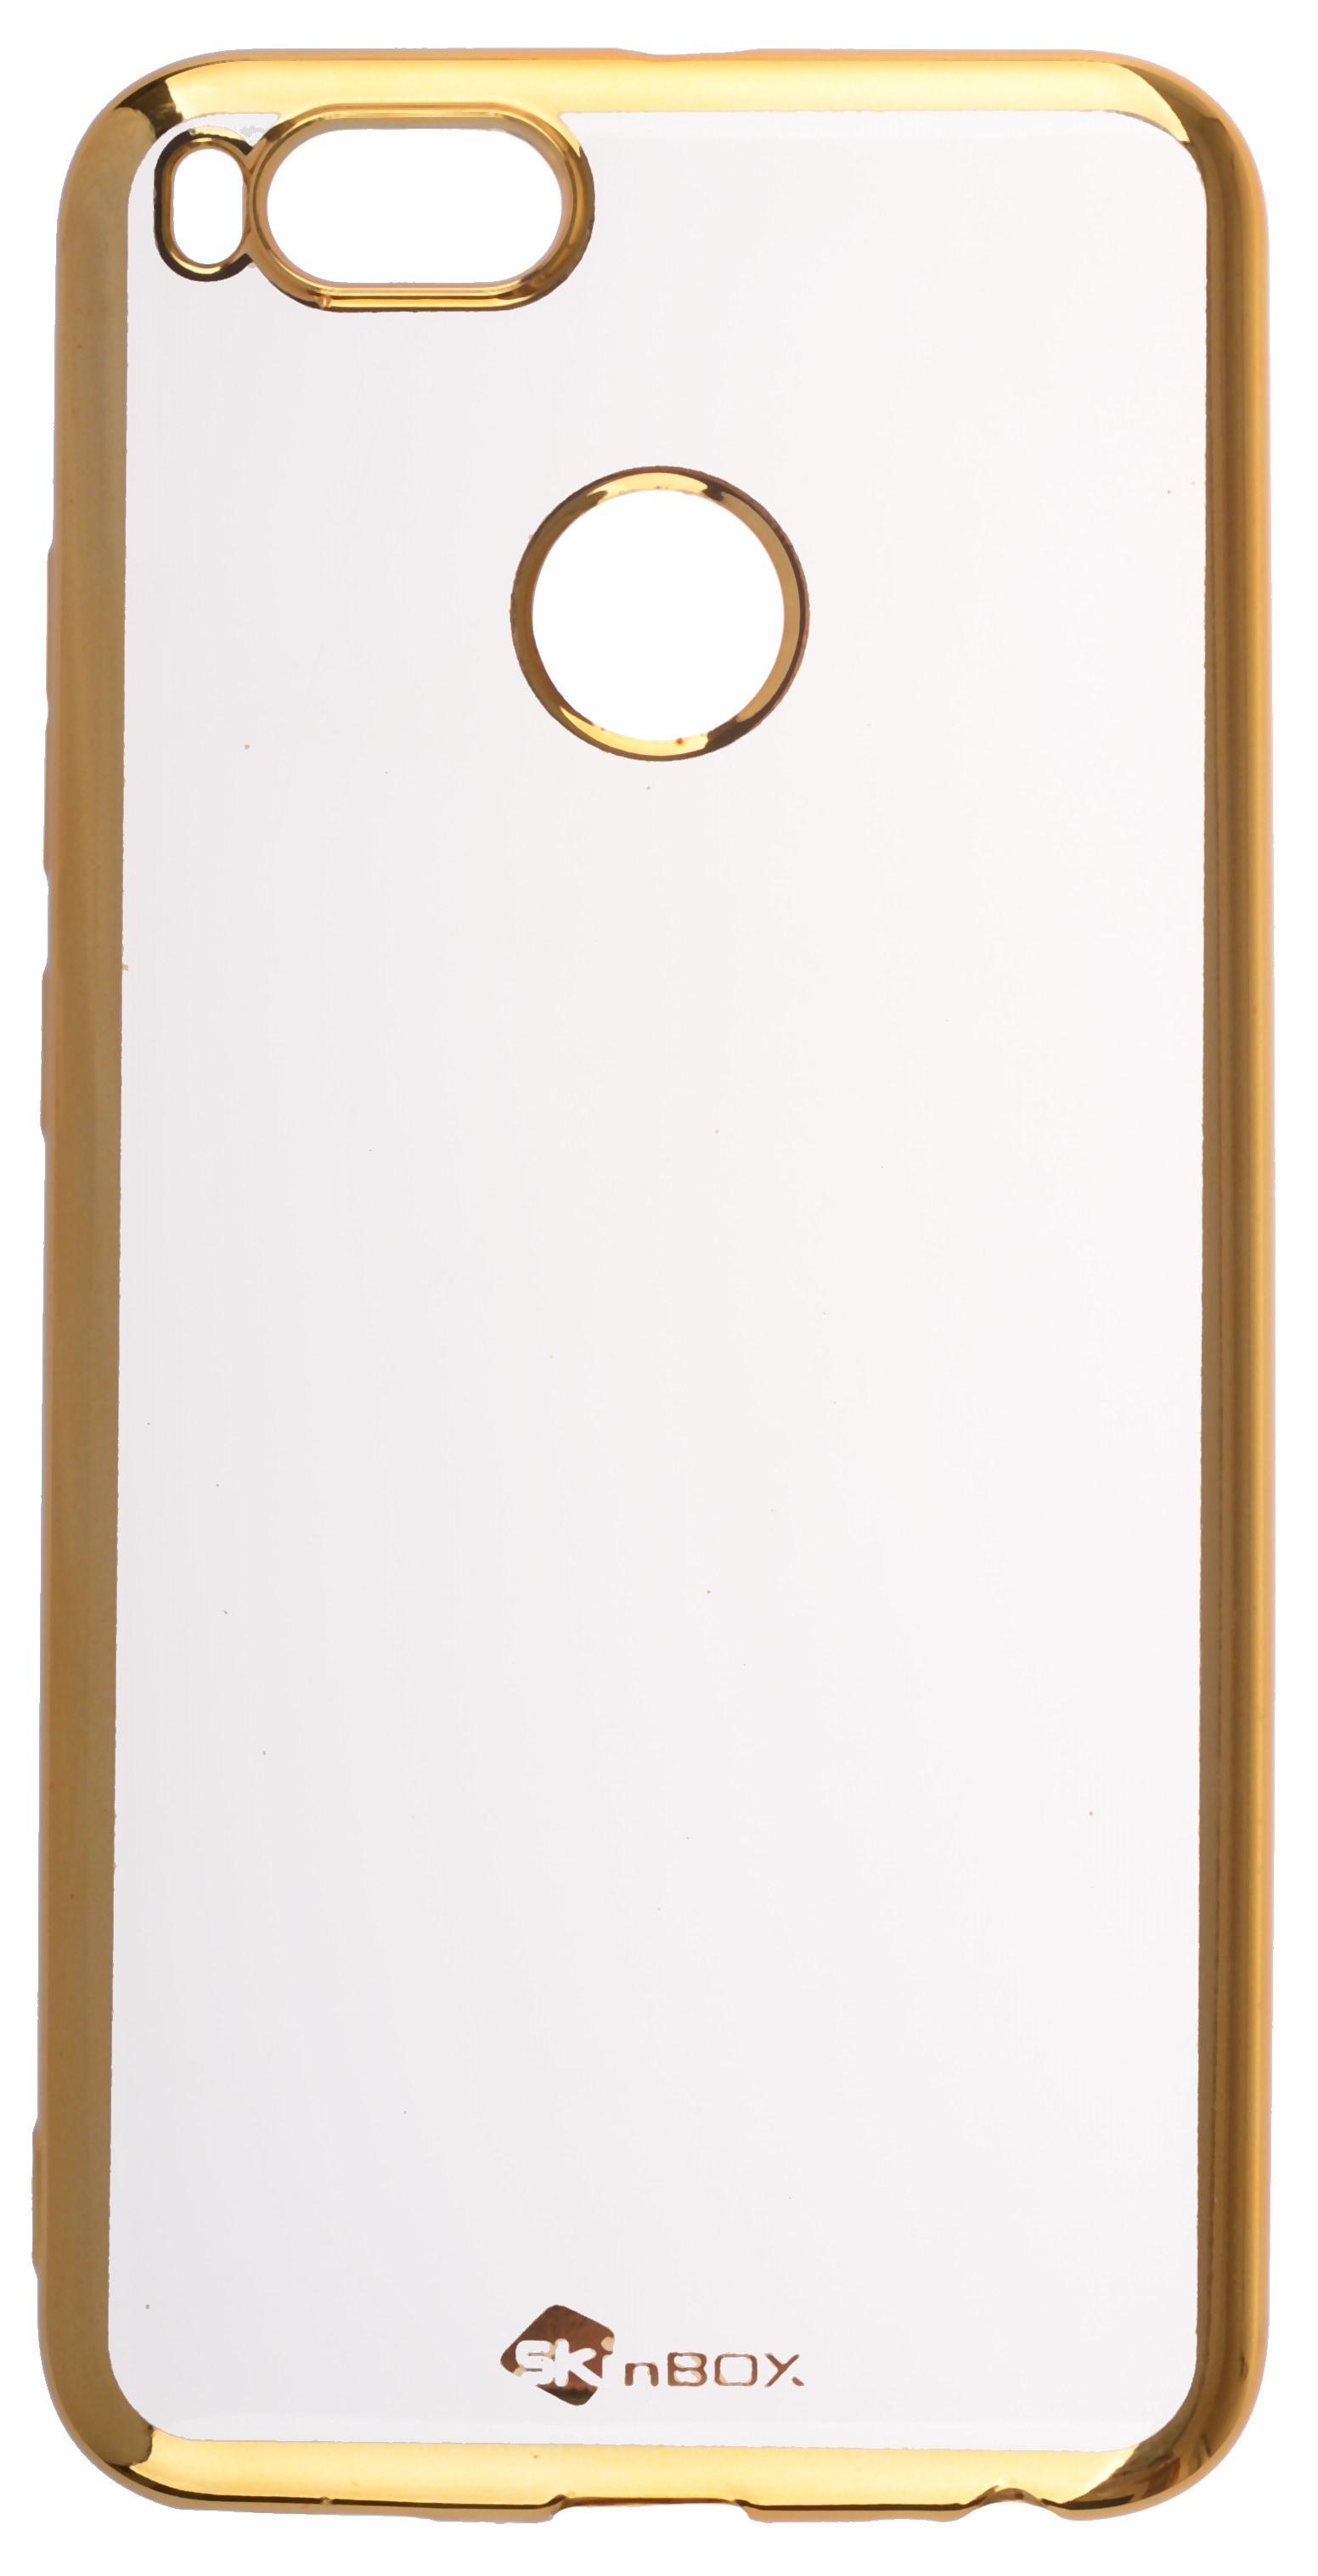 Чехол для сотового телефона skinBOX Silicone chrome border, 4660041409376, золотой skinbox 4people slim silicone чехол накладка для xiaomi redmi 4a transparent